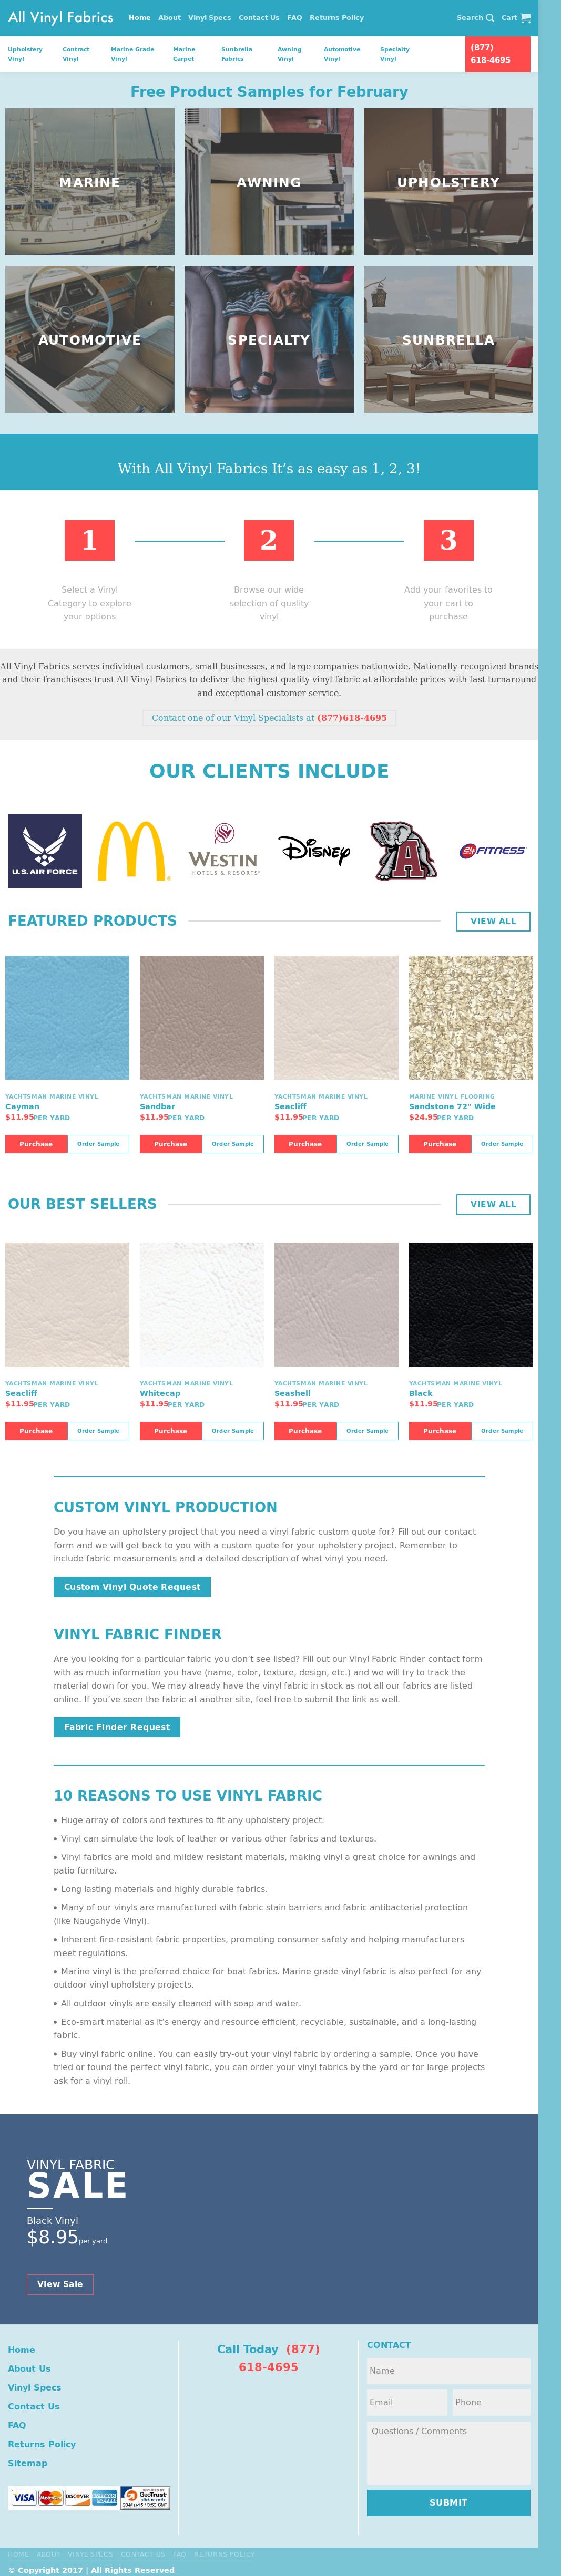 Allvinylfabrics Competitors, Revenue and Employees - Owler